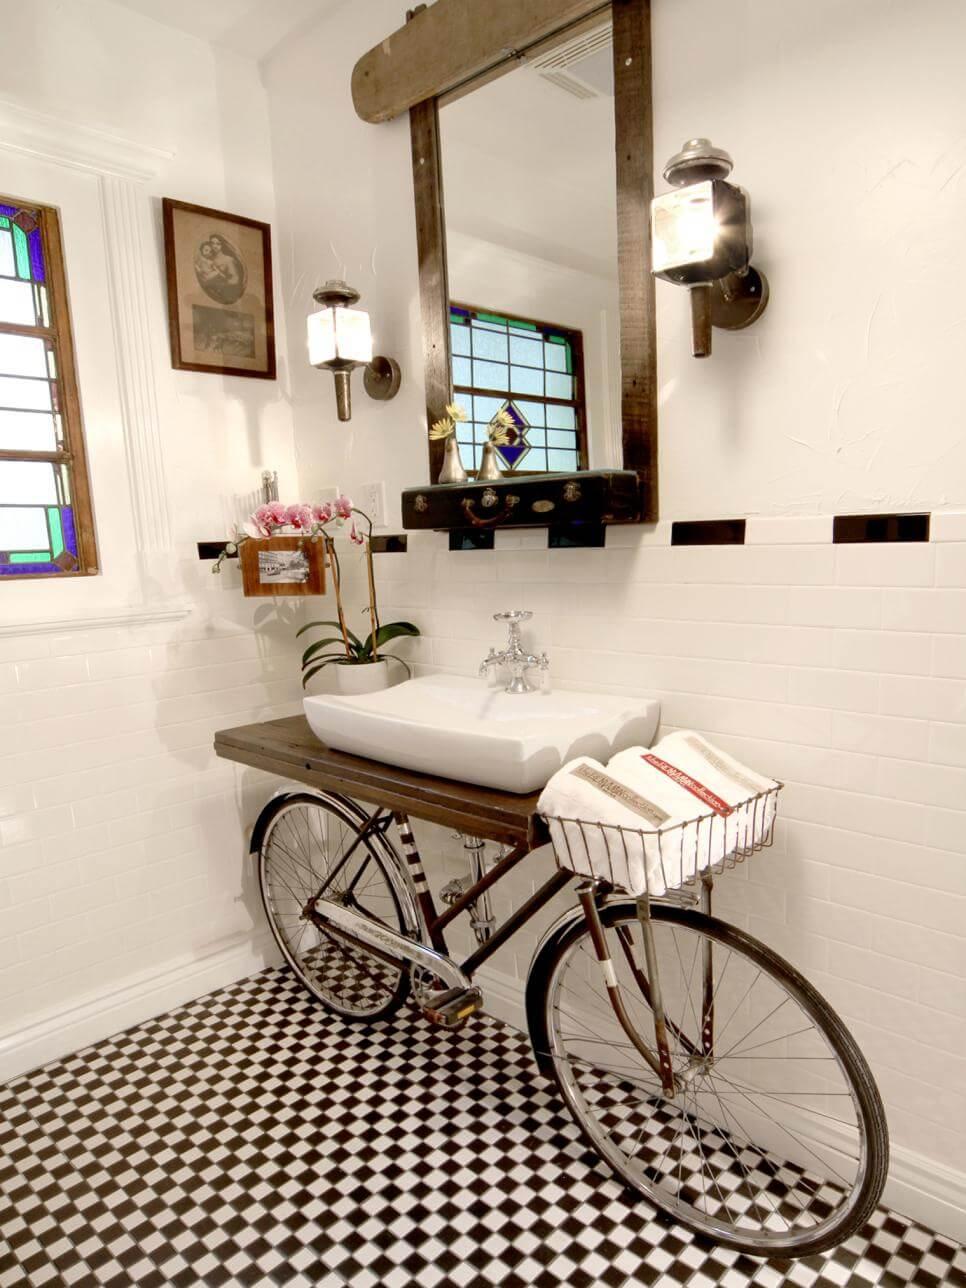 Brilliant DIY bathroom vanity